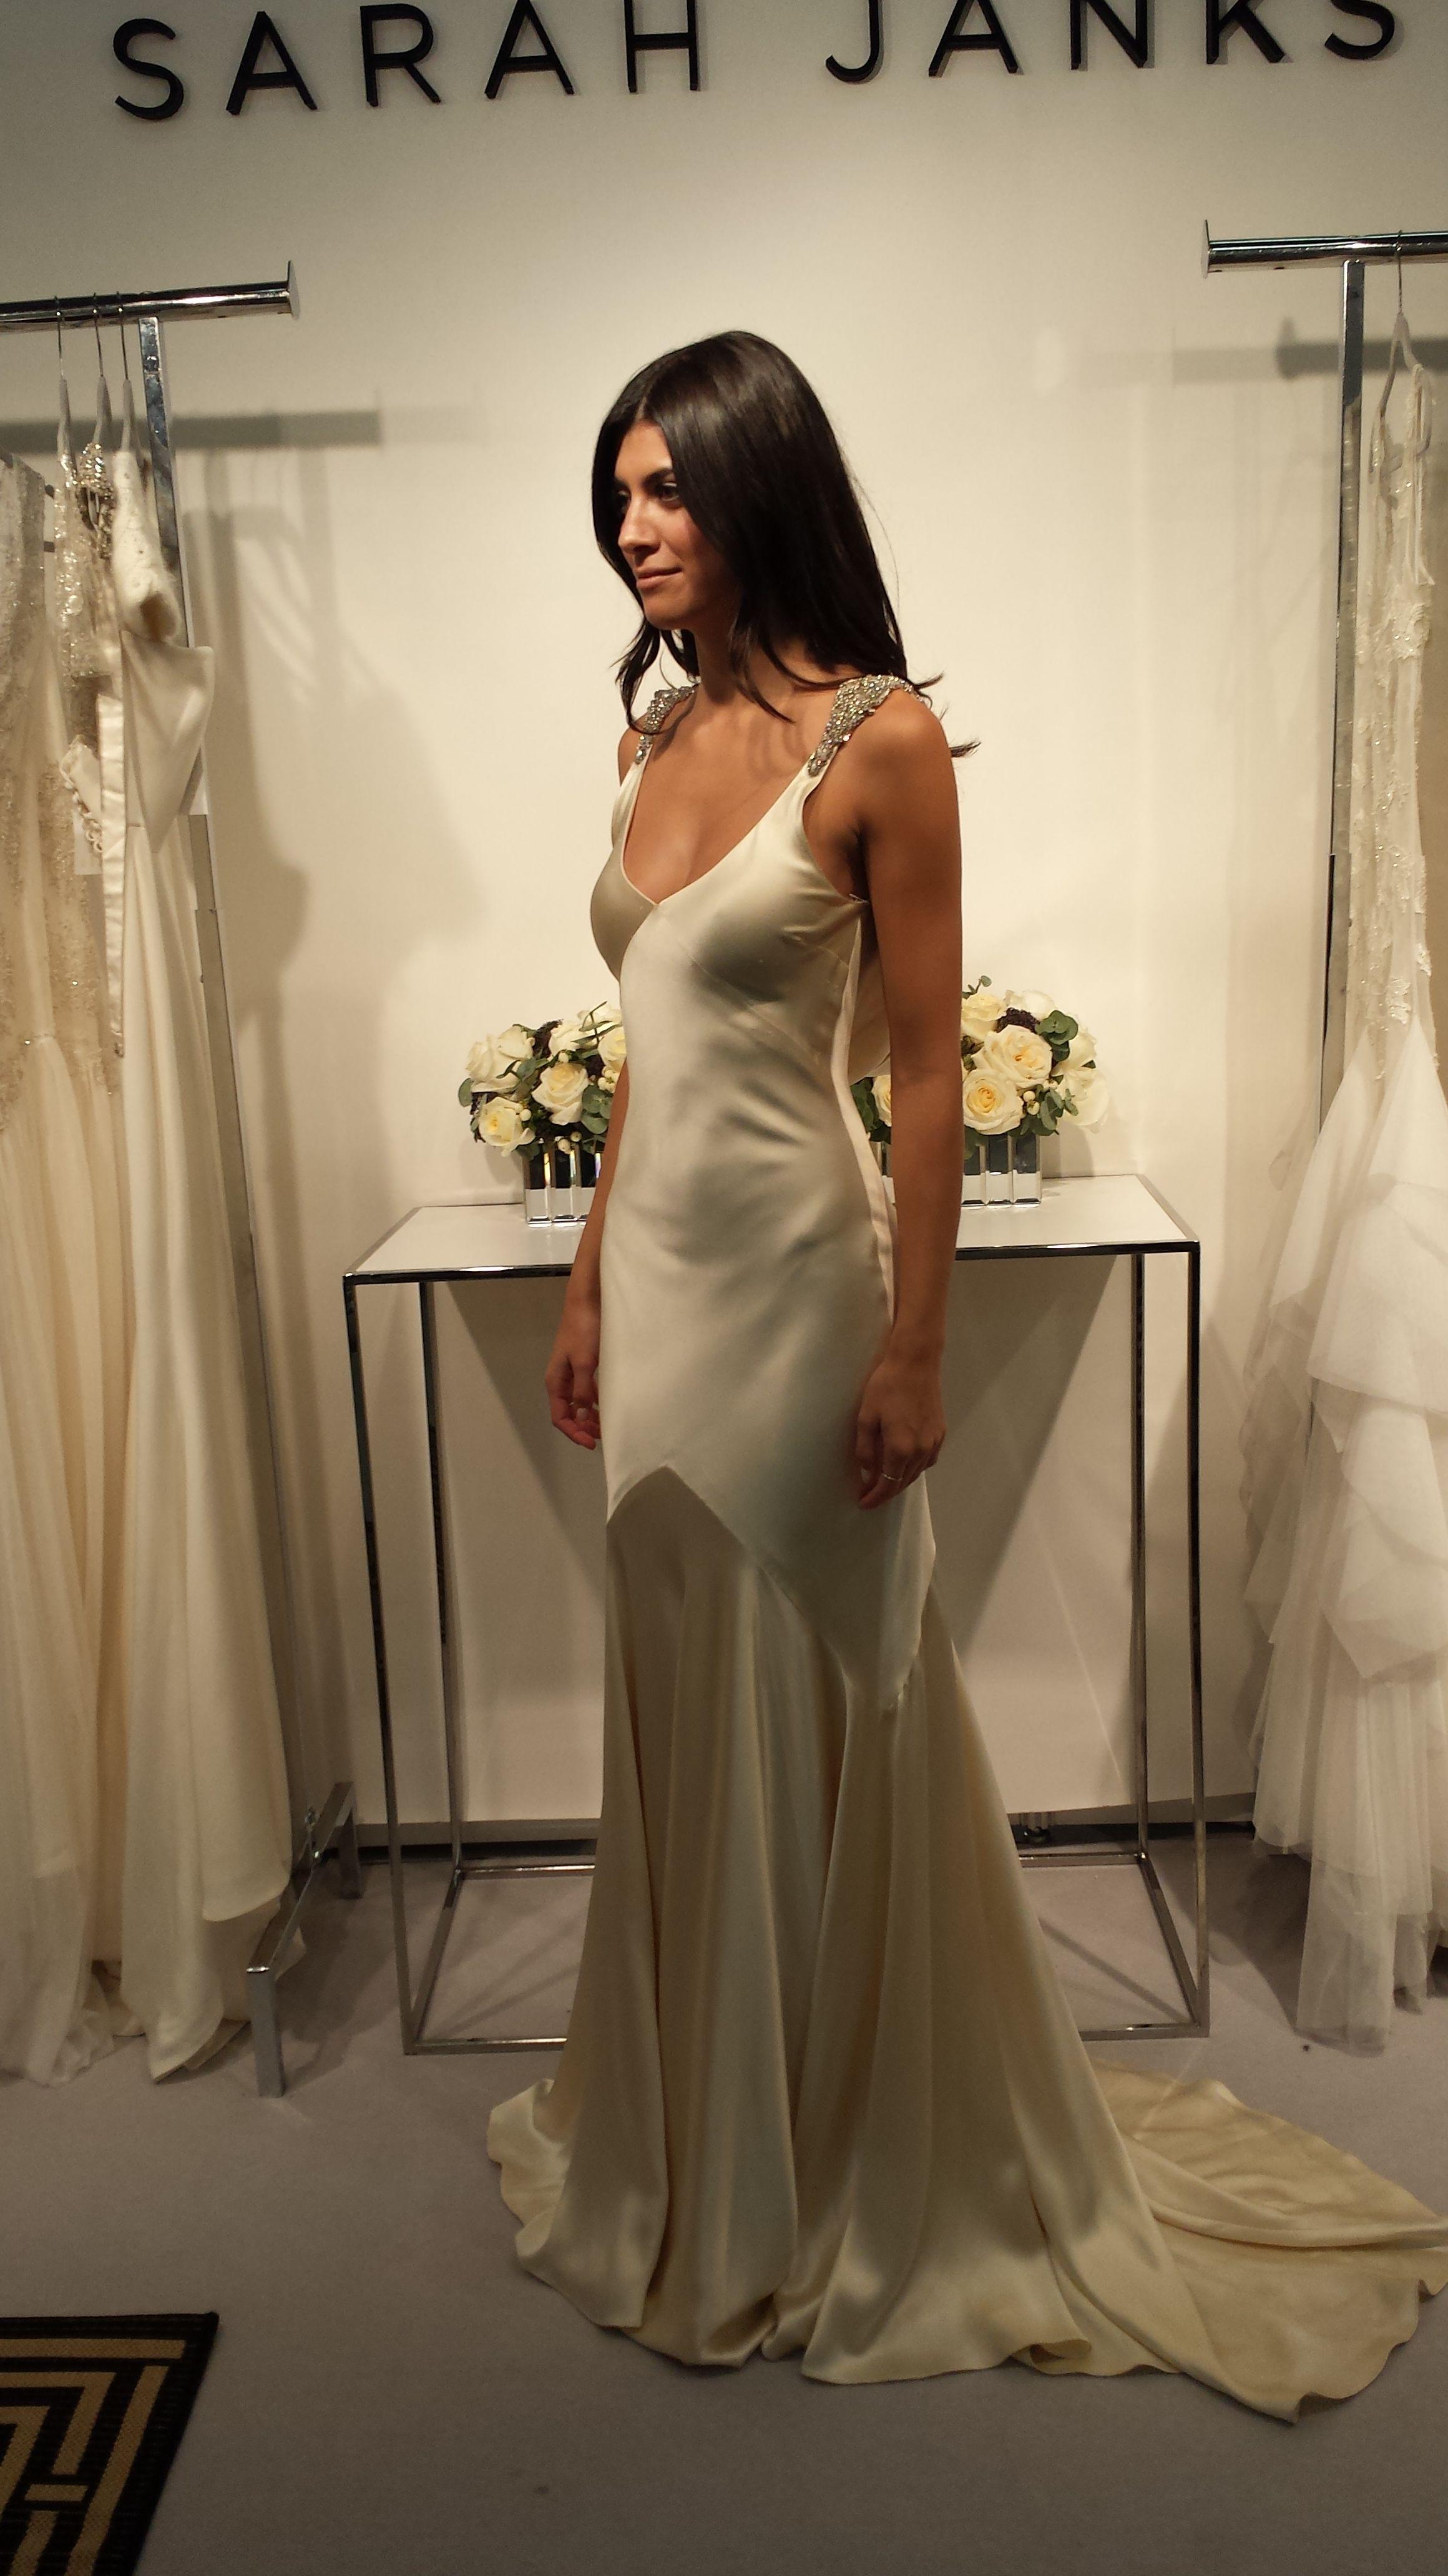 e9640e0bd527 Bias-cut silk charmeuse is so divine...and glamorous! Sarah Janks ...